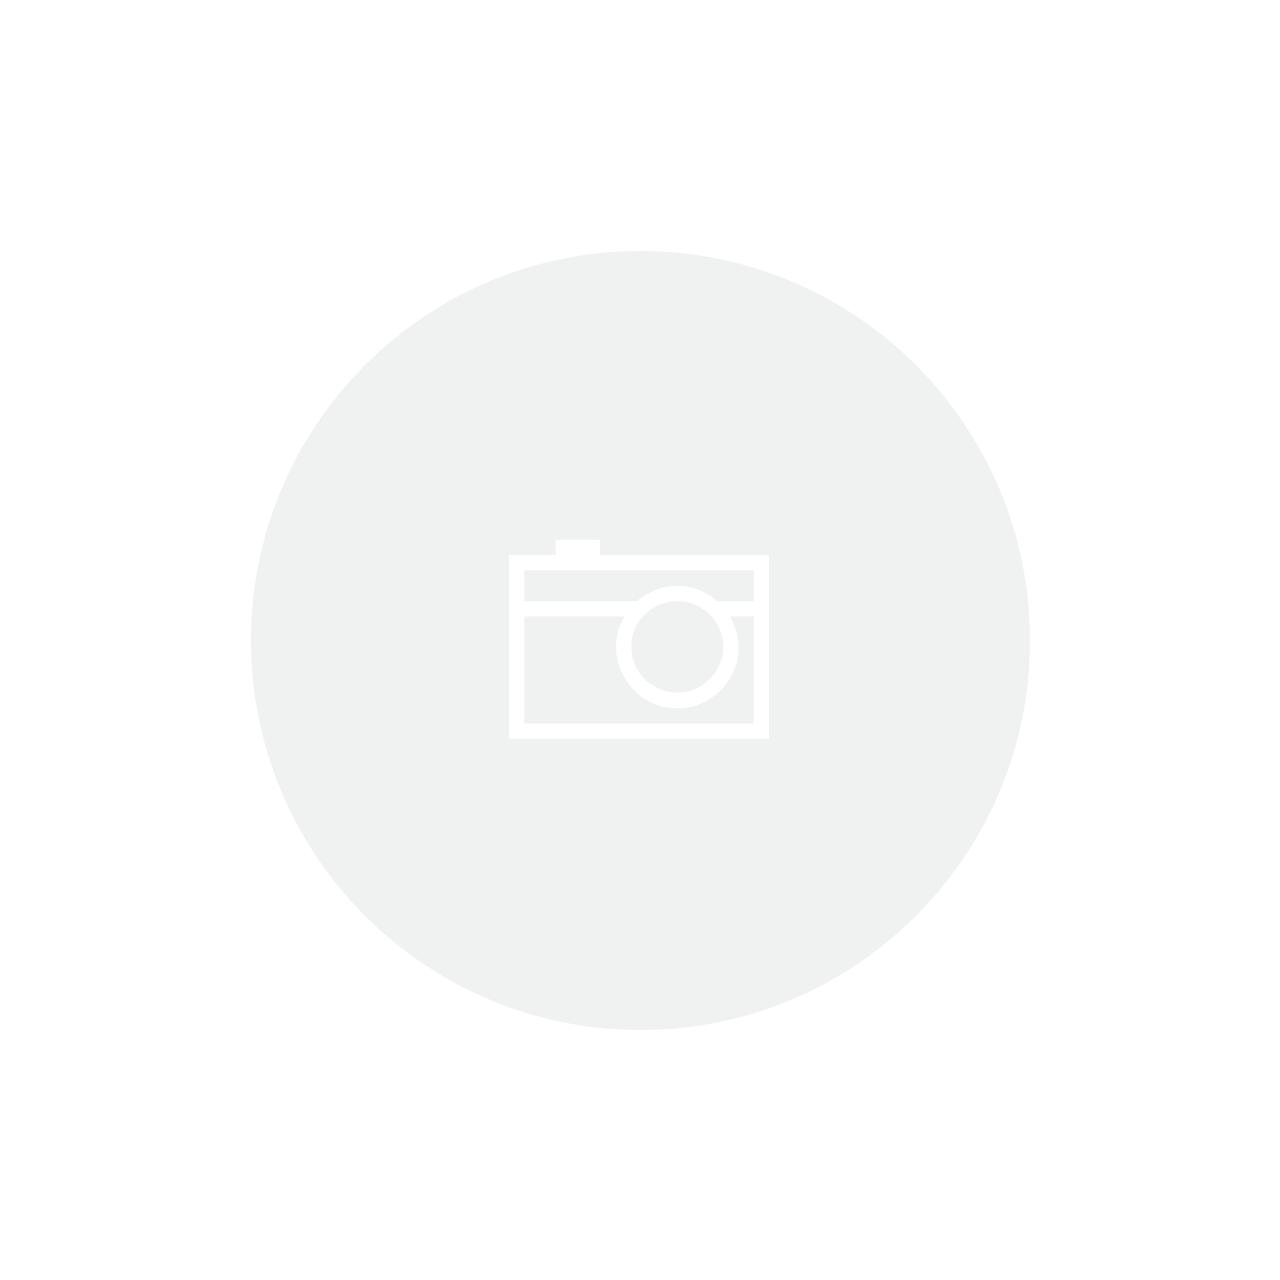 CÂMBIO DIAN DUAL PULL SHIMANO DEORE XT 2x10V FD-M785 31,8mm